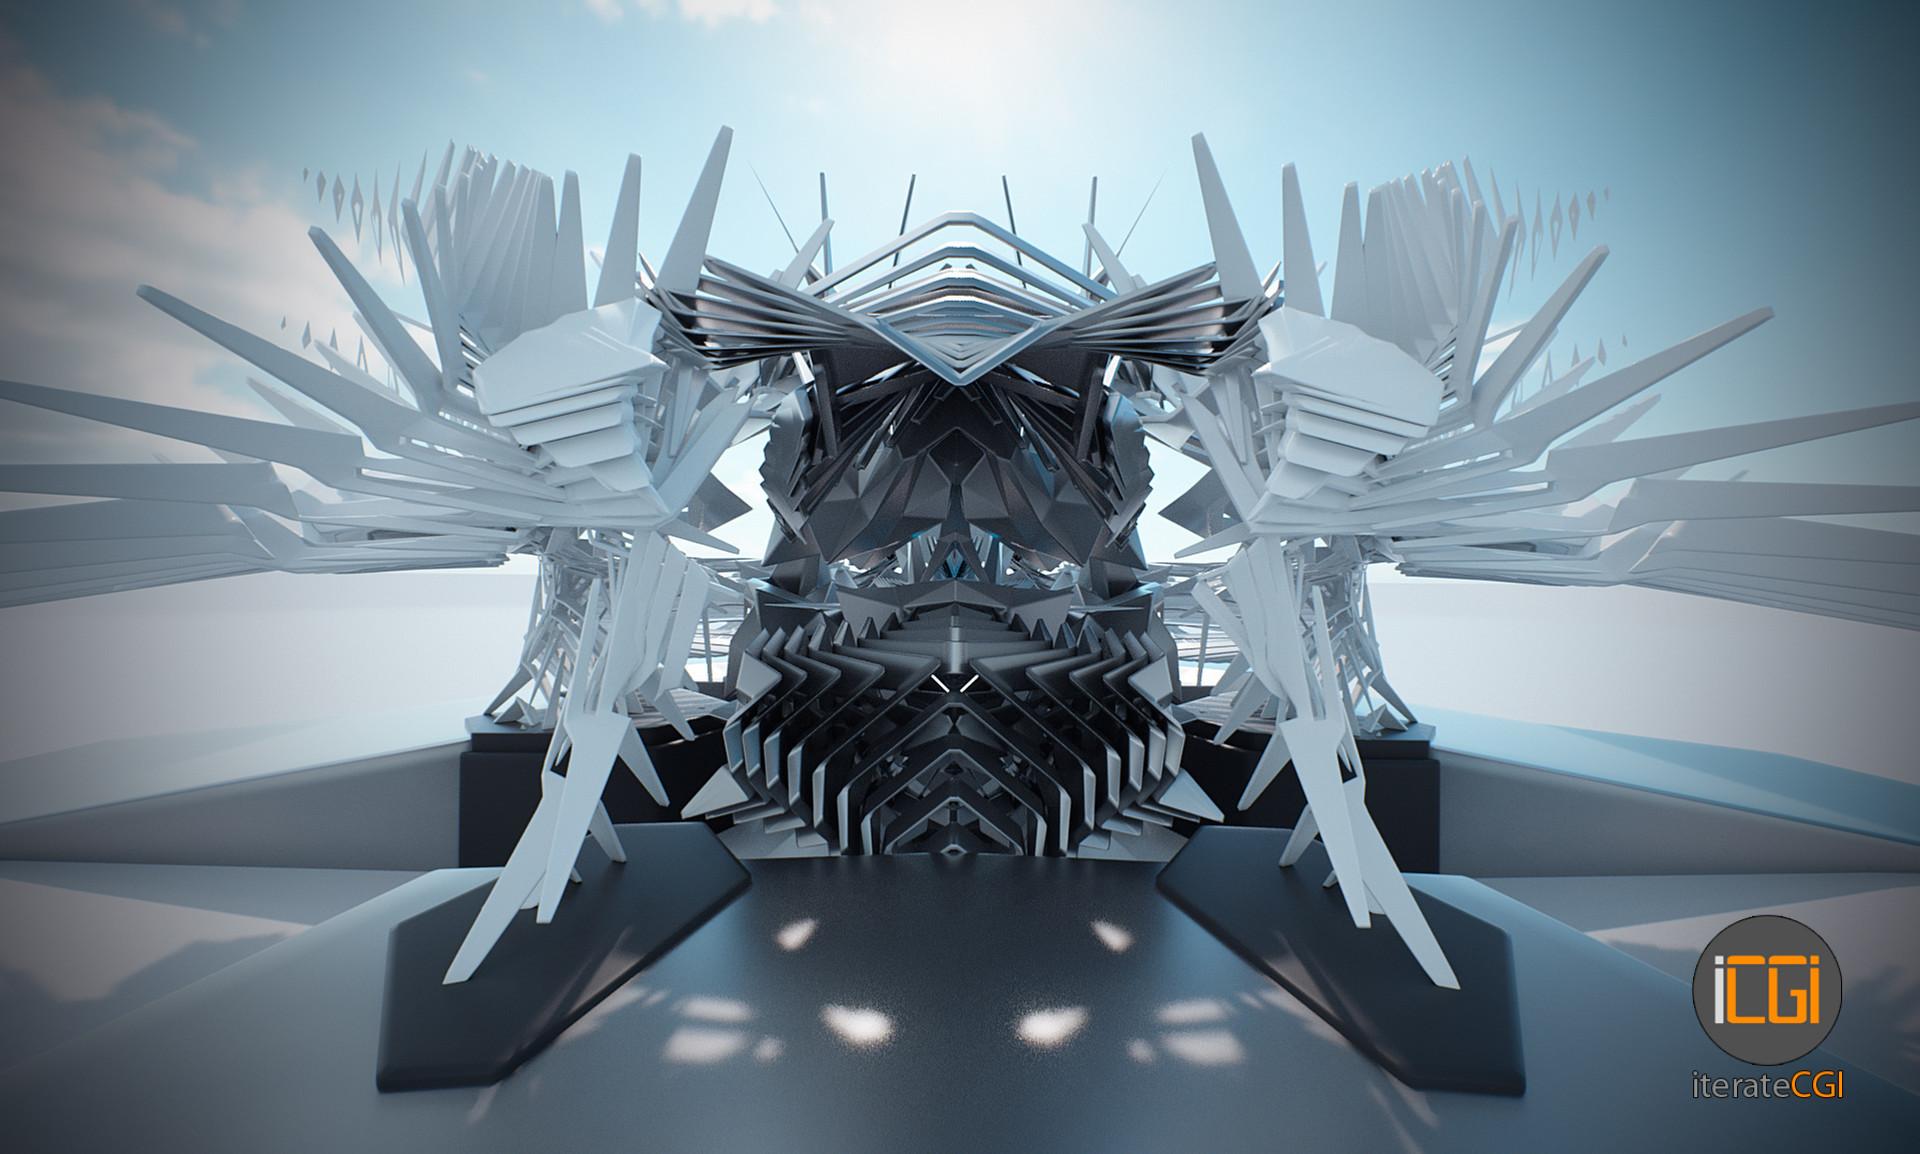 Johan de leenheer generative 3d symmetries 5